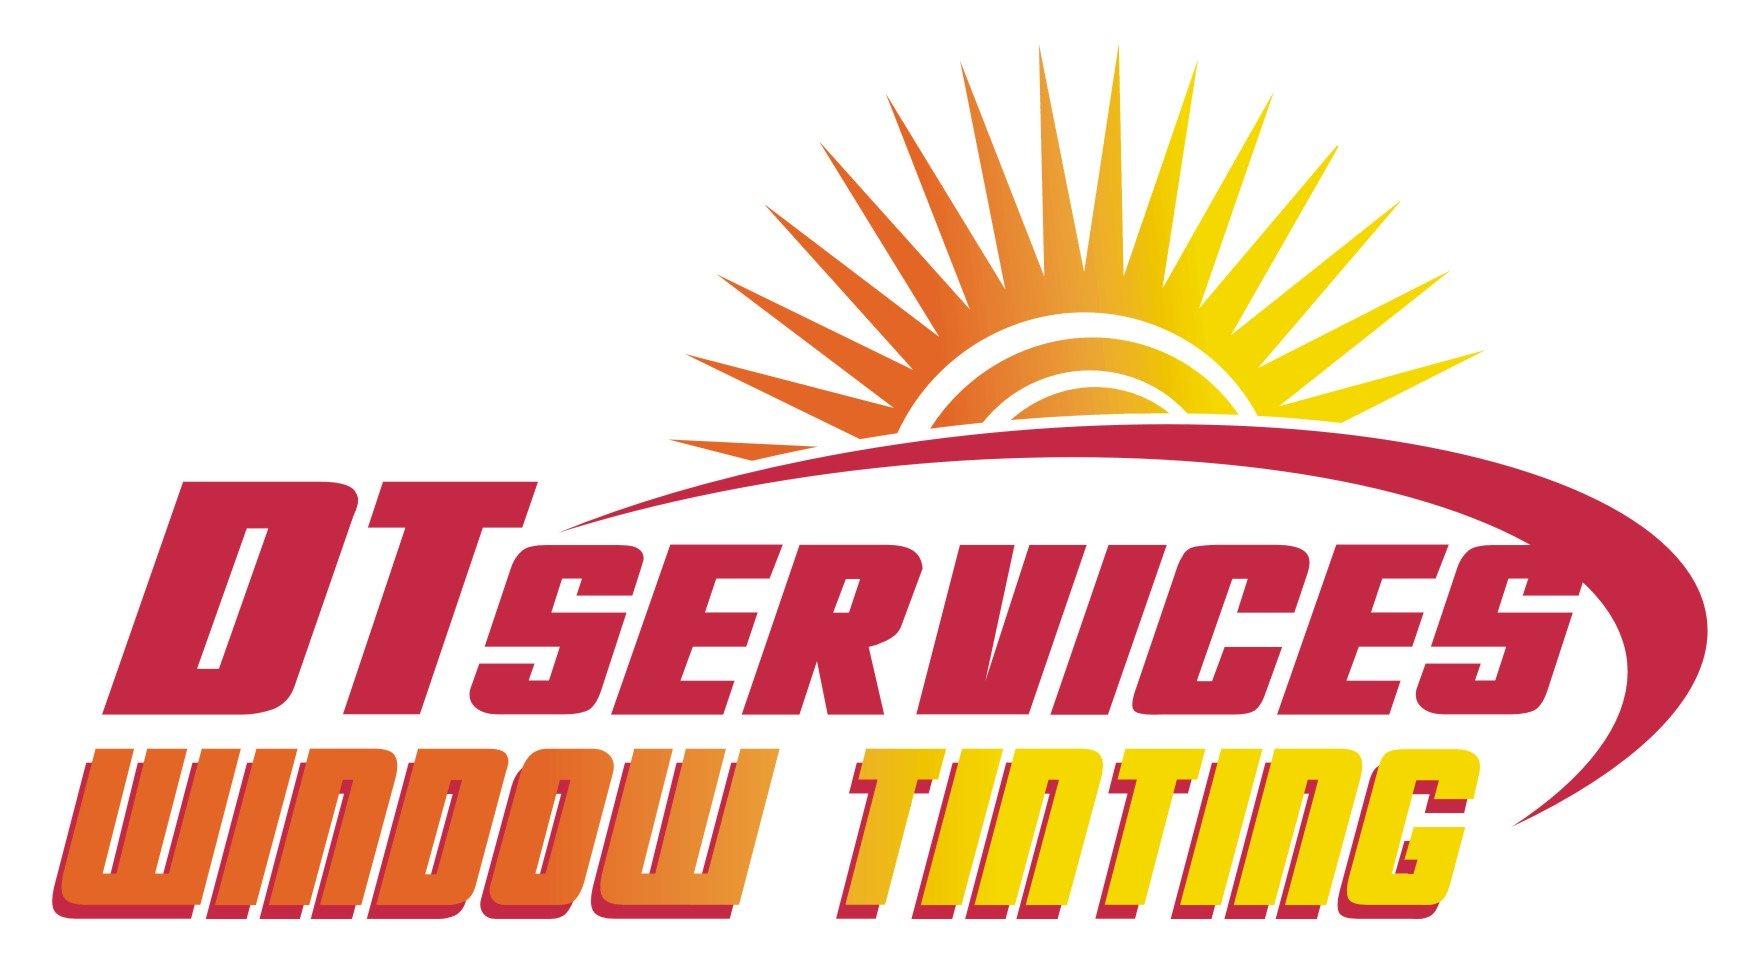 DT Services Window Tinting LLC